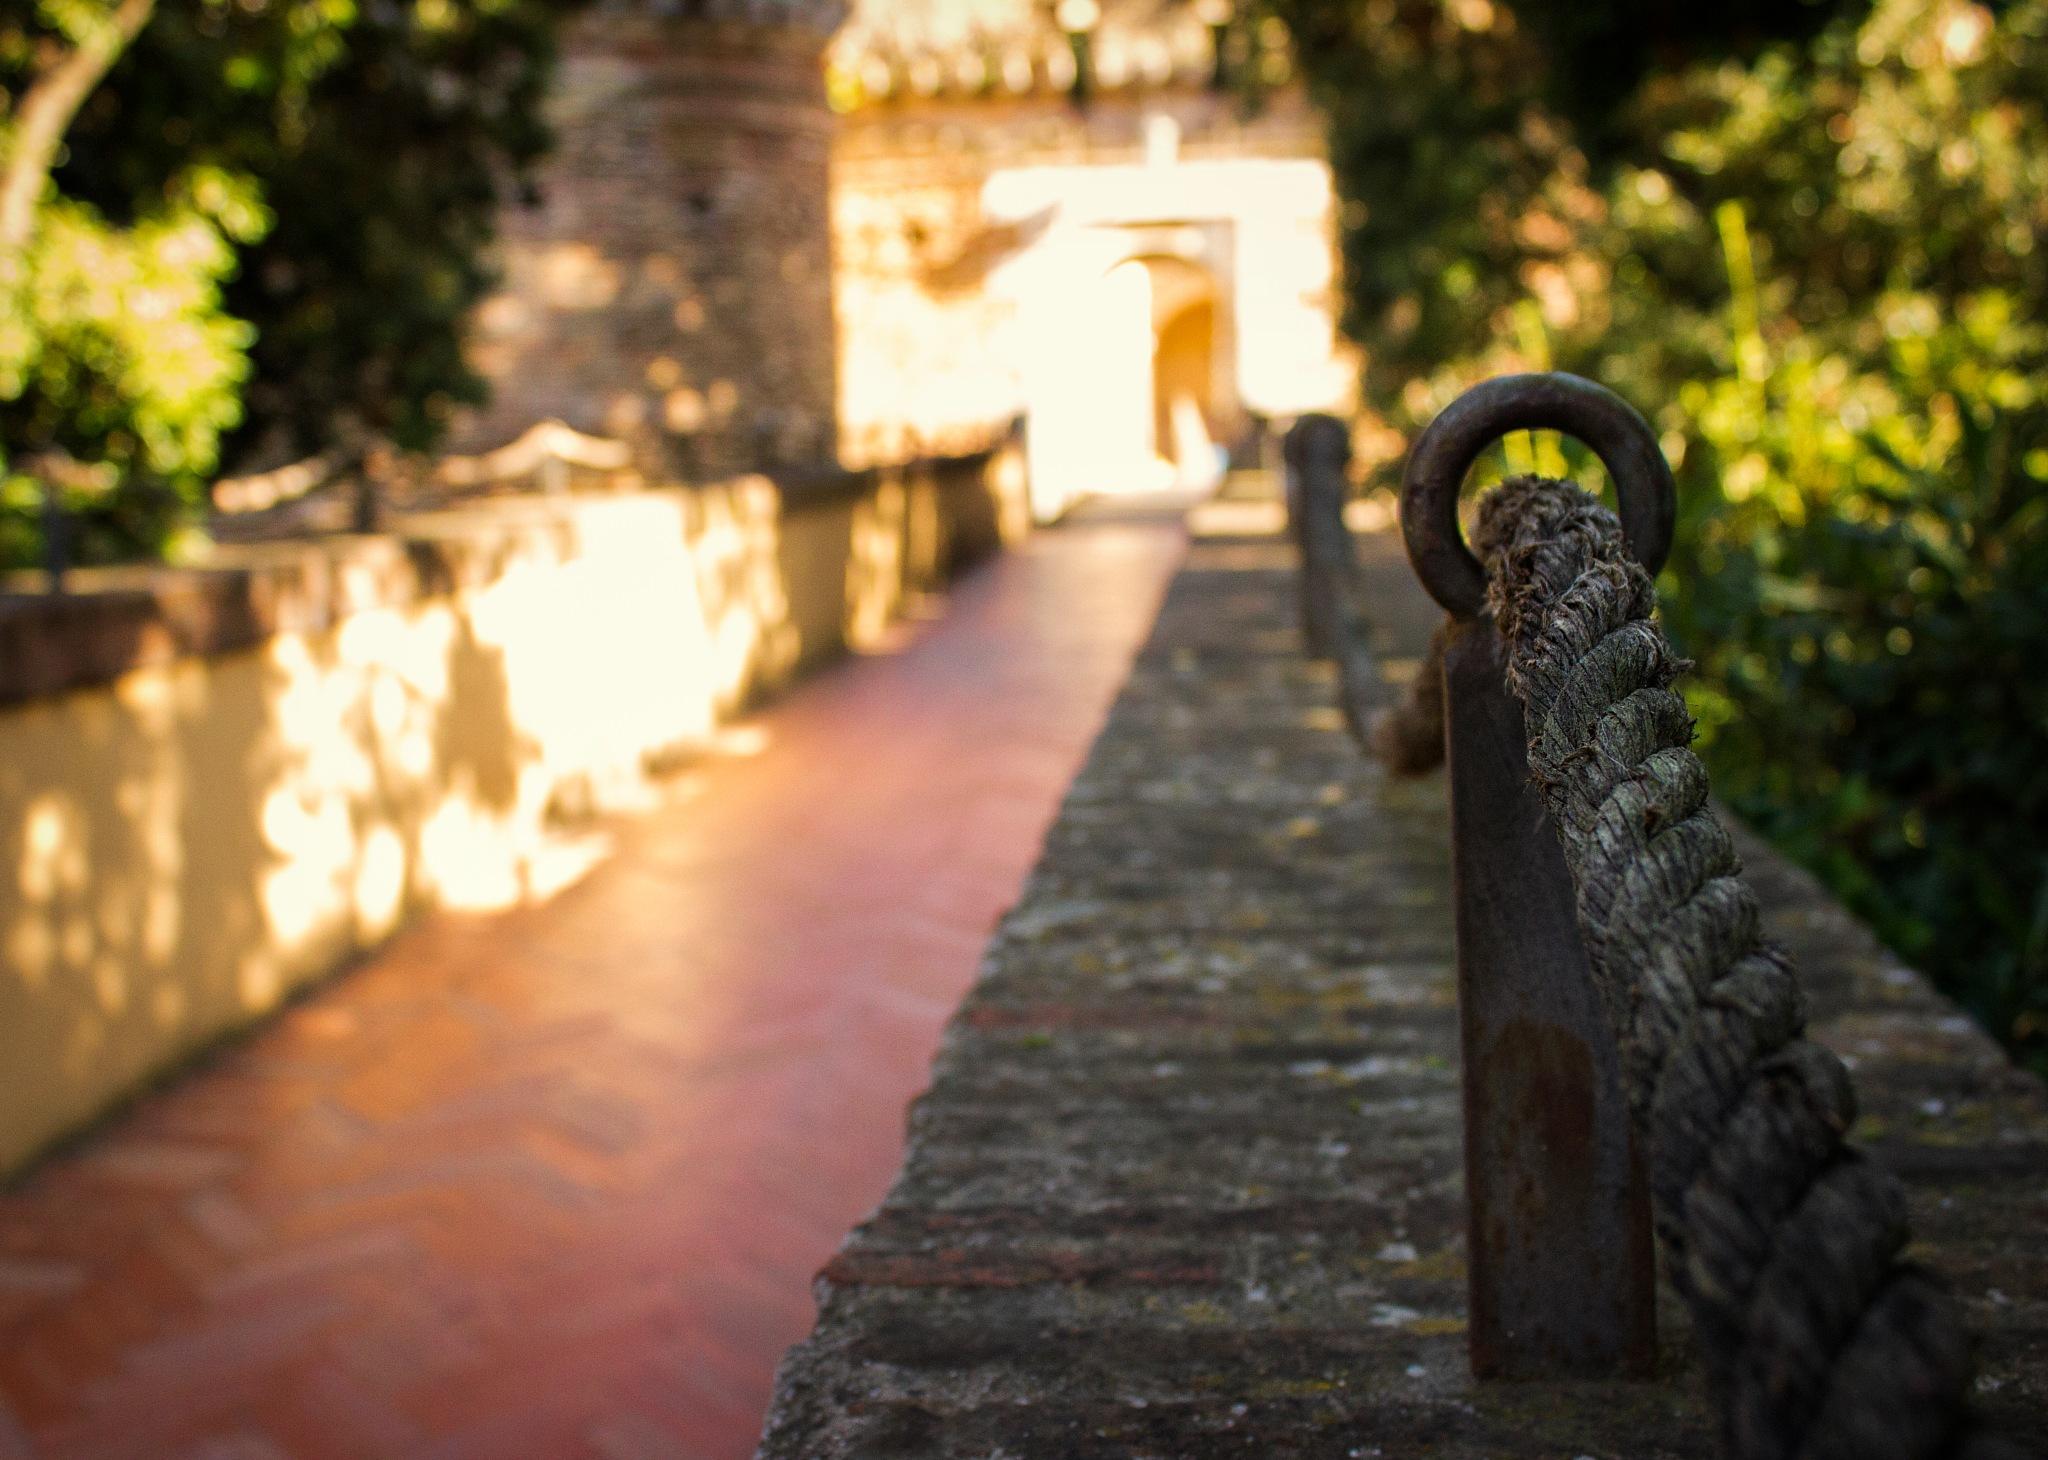 The Castello Borghese by Marcio Muniz